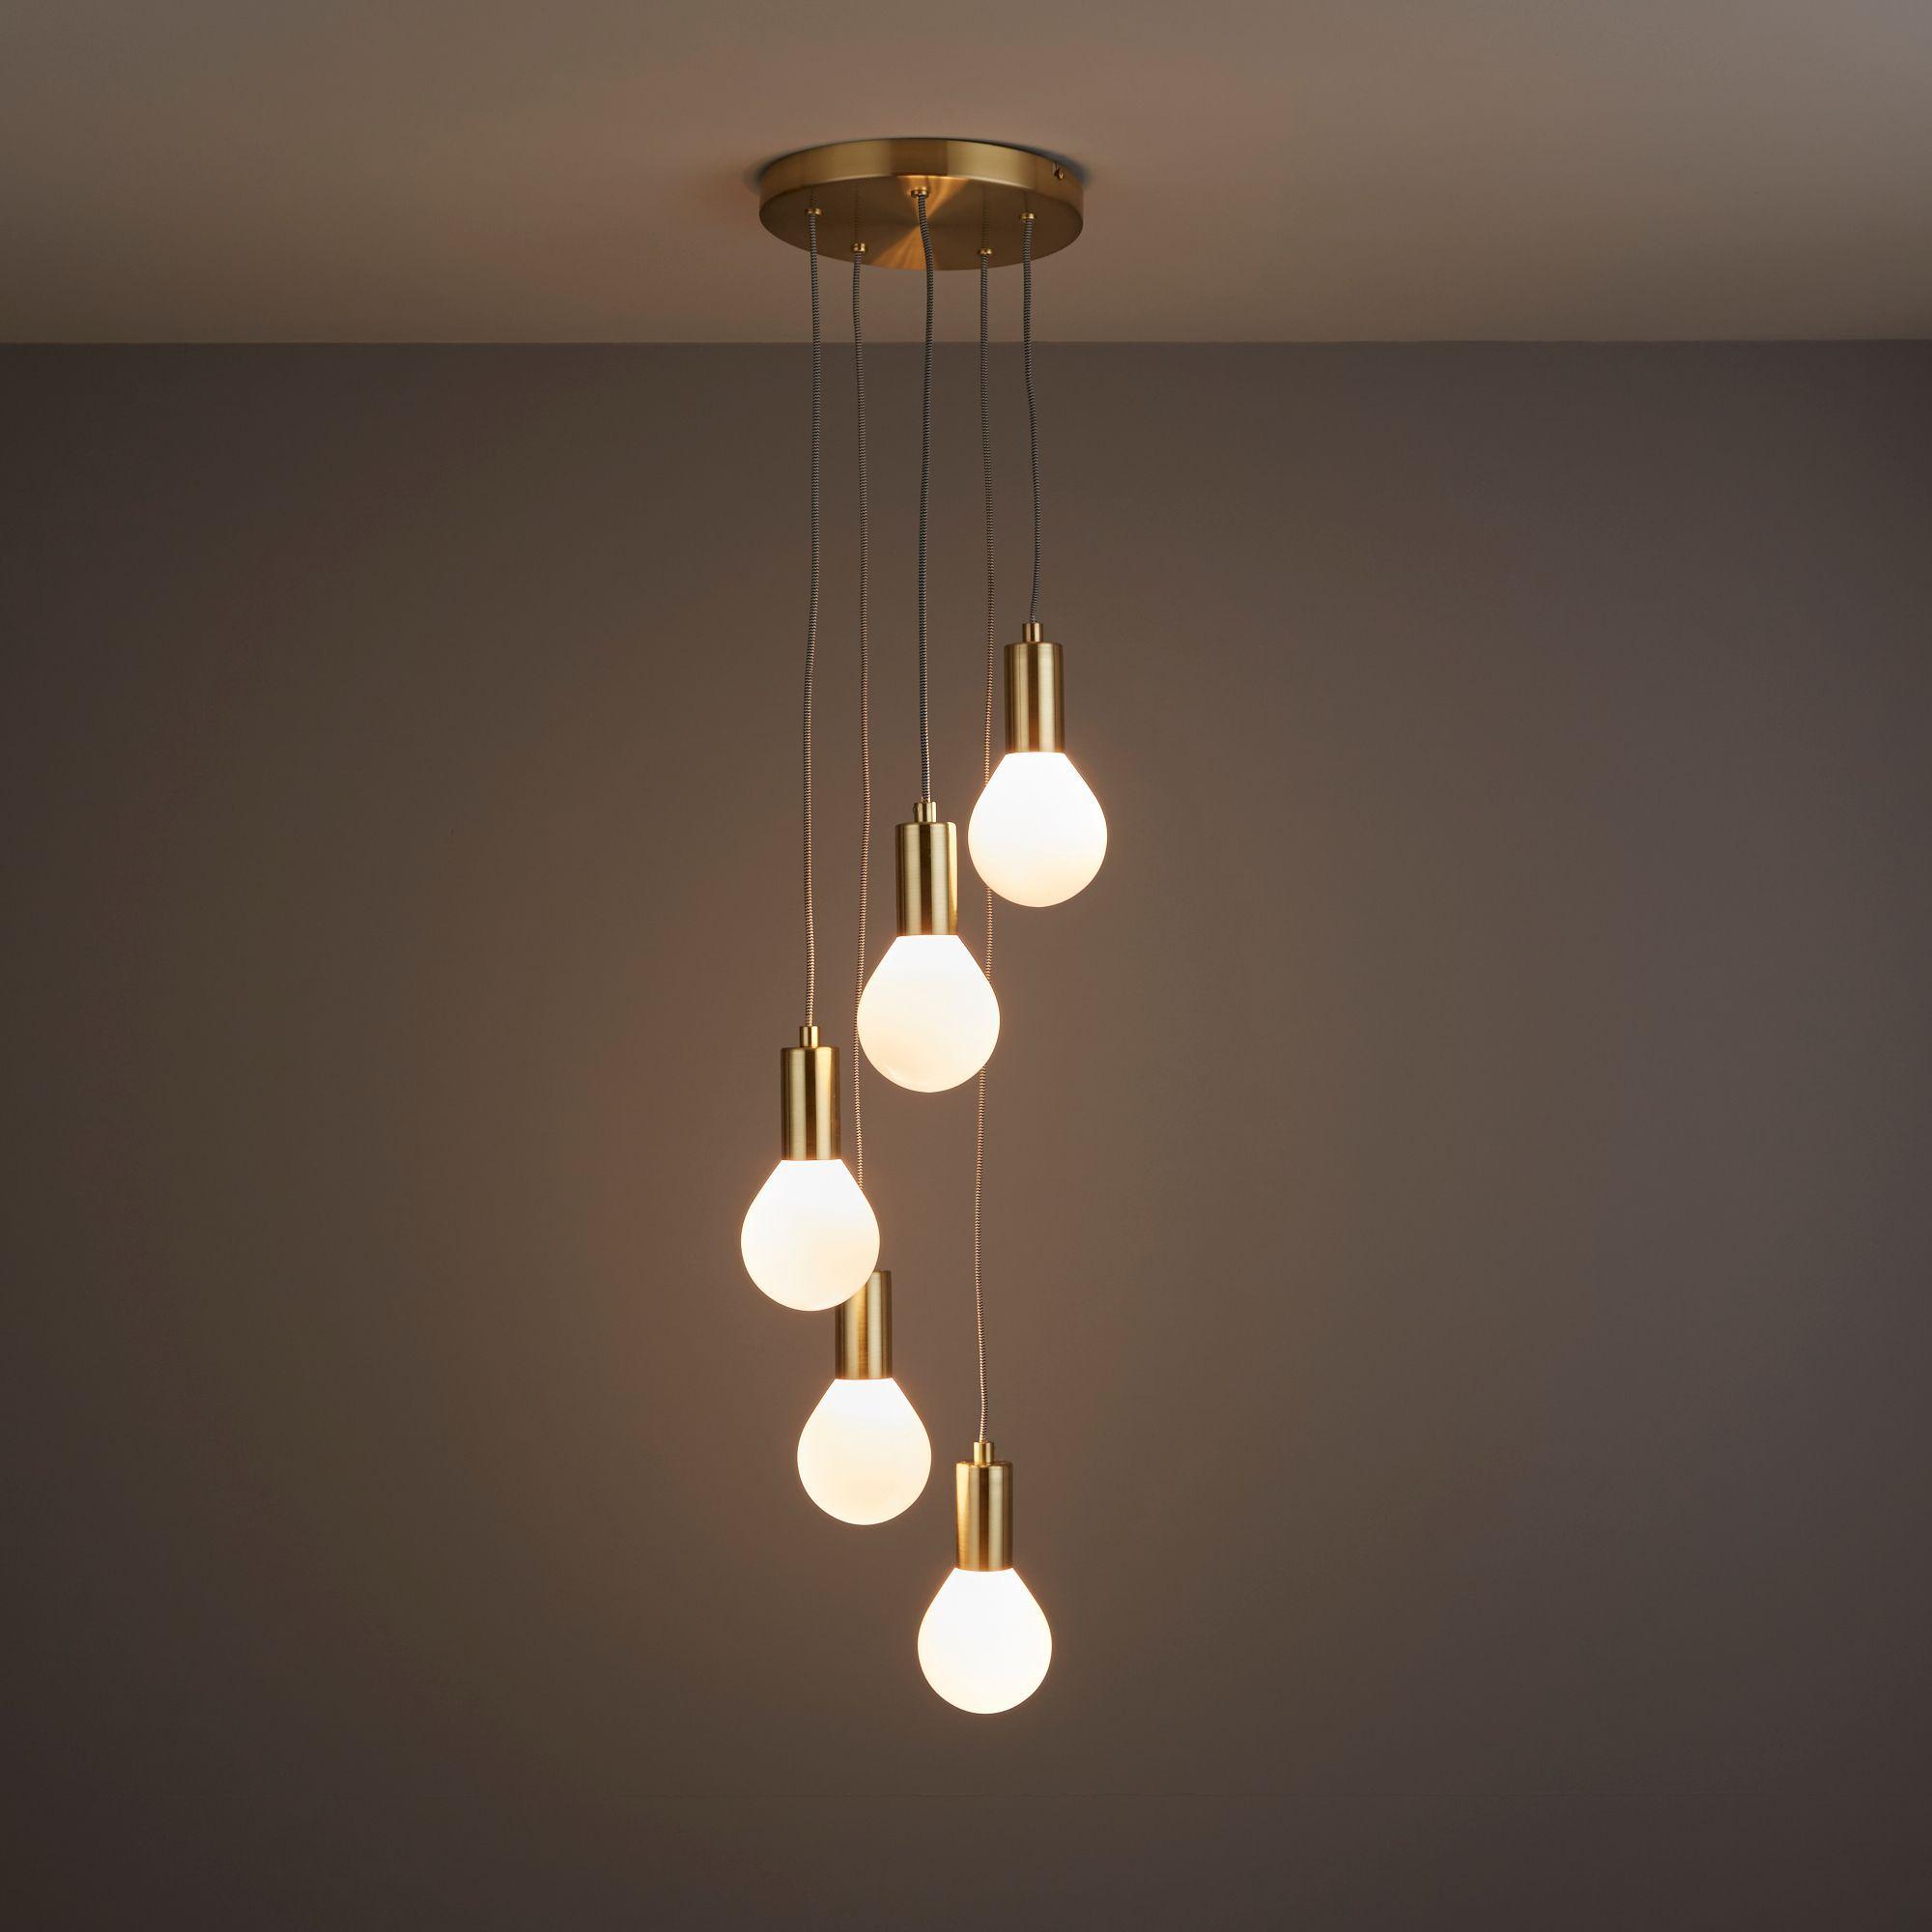 Channing Modern Gold Satin Brushed 5 Lamp Ceiling Light